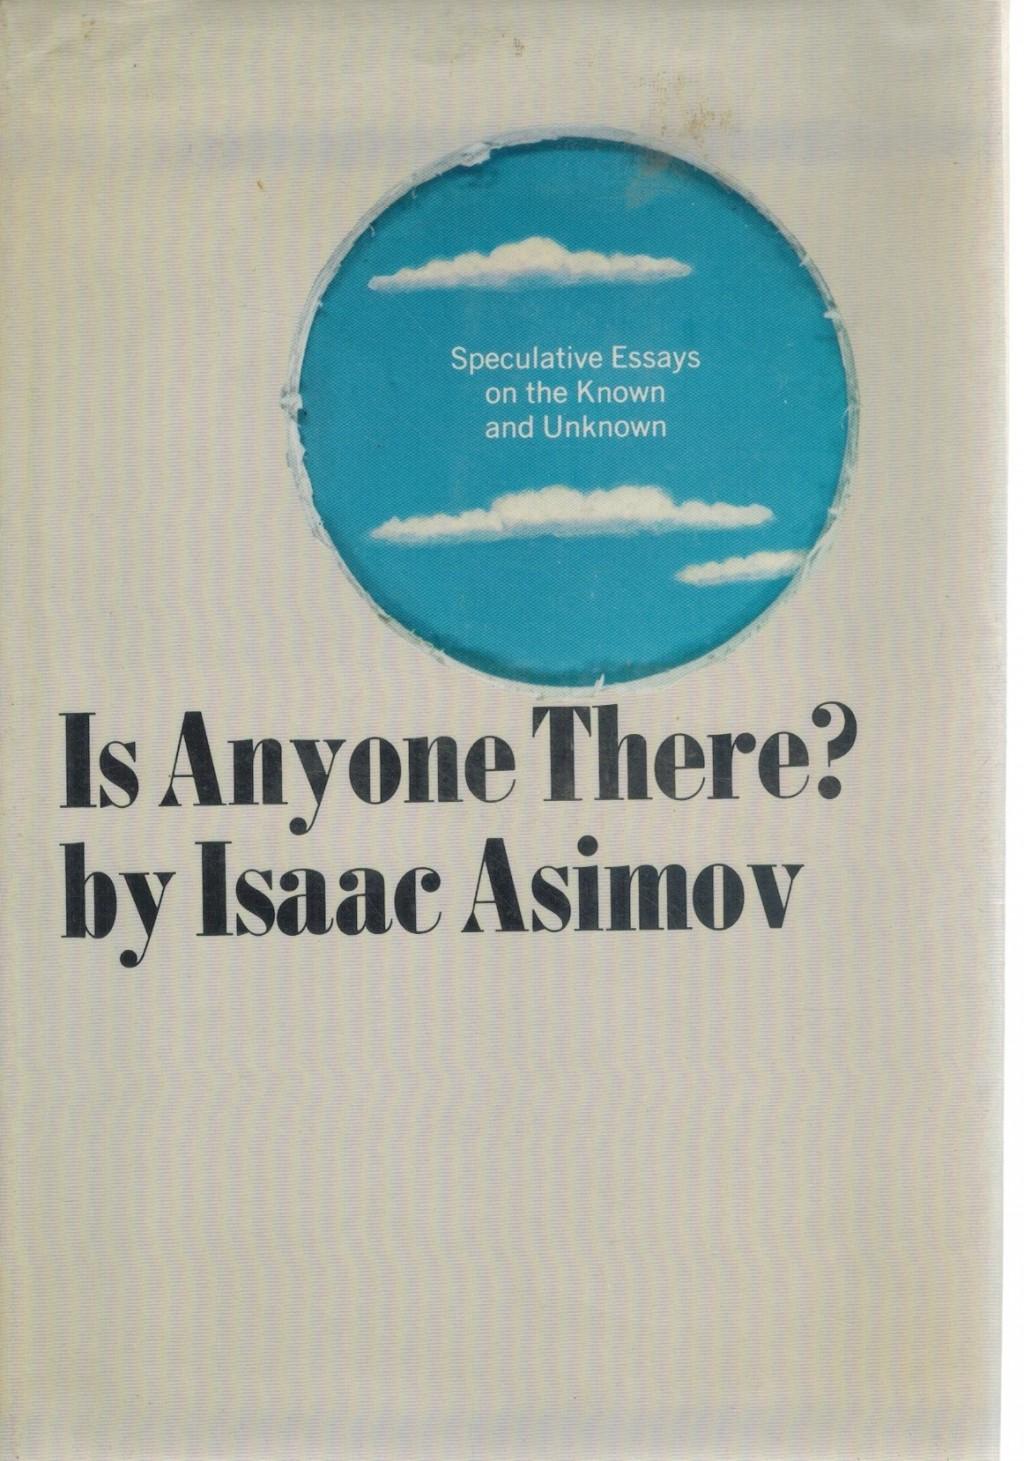 008 81xccmq2bmol Essay Example Isaac Asimov Awful Essays On Creativity Intelligence Large